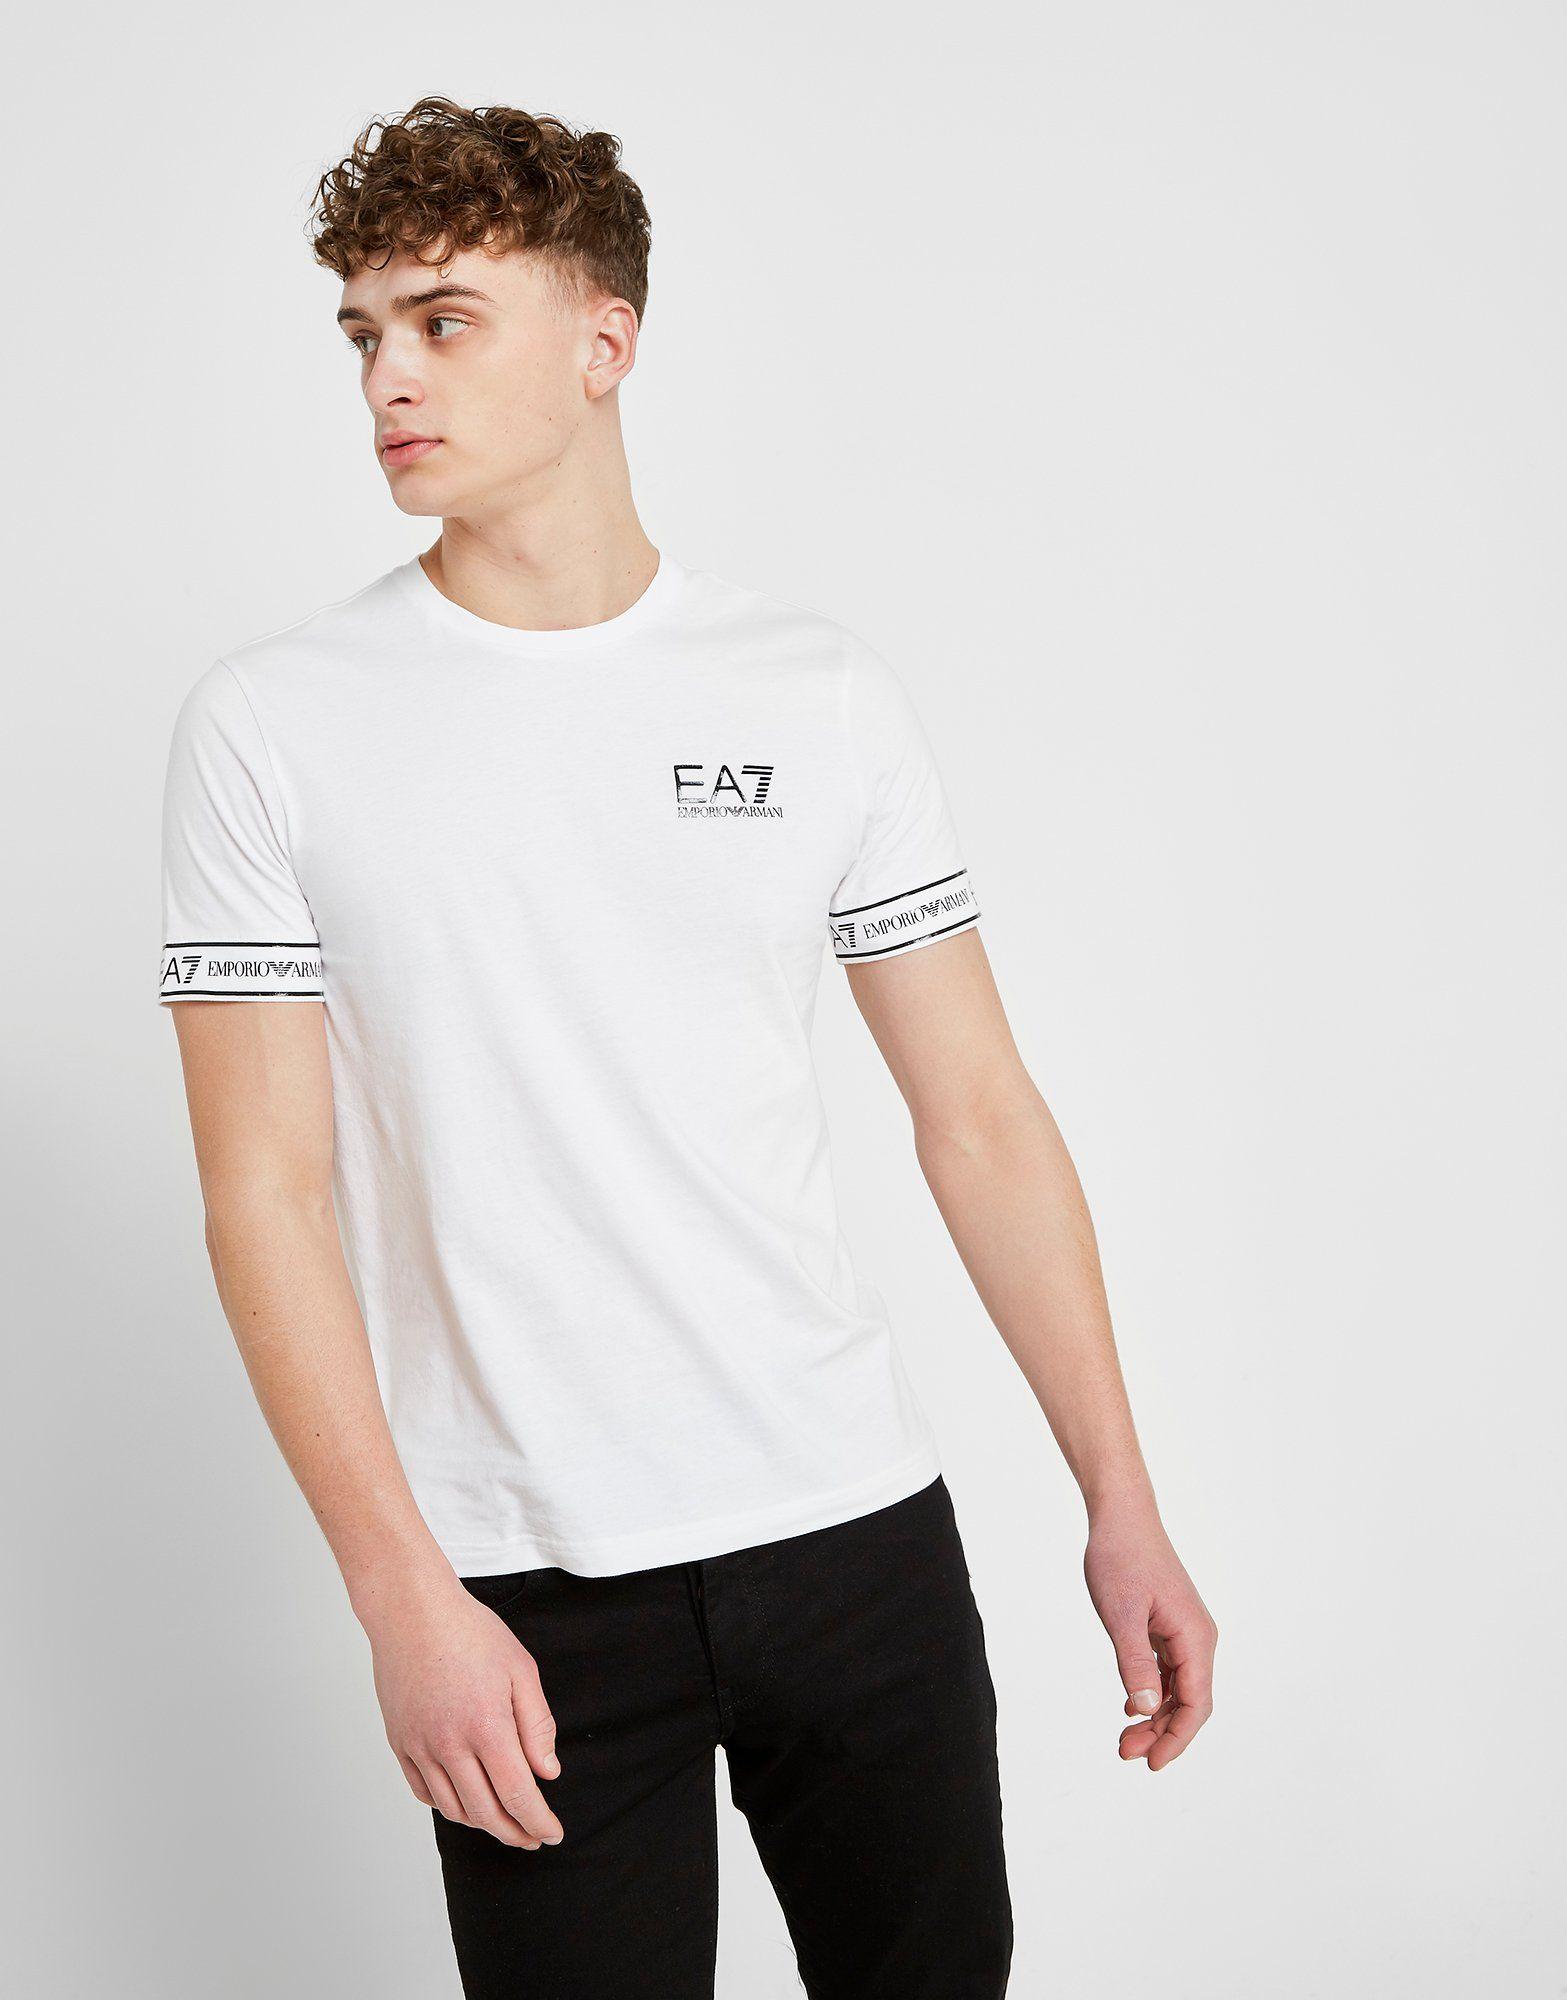 5bbae622bca Emporio Armani EA7 Short Sleeve Tape T-Shirt